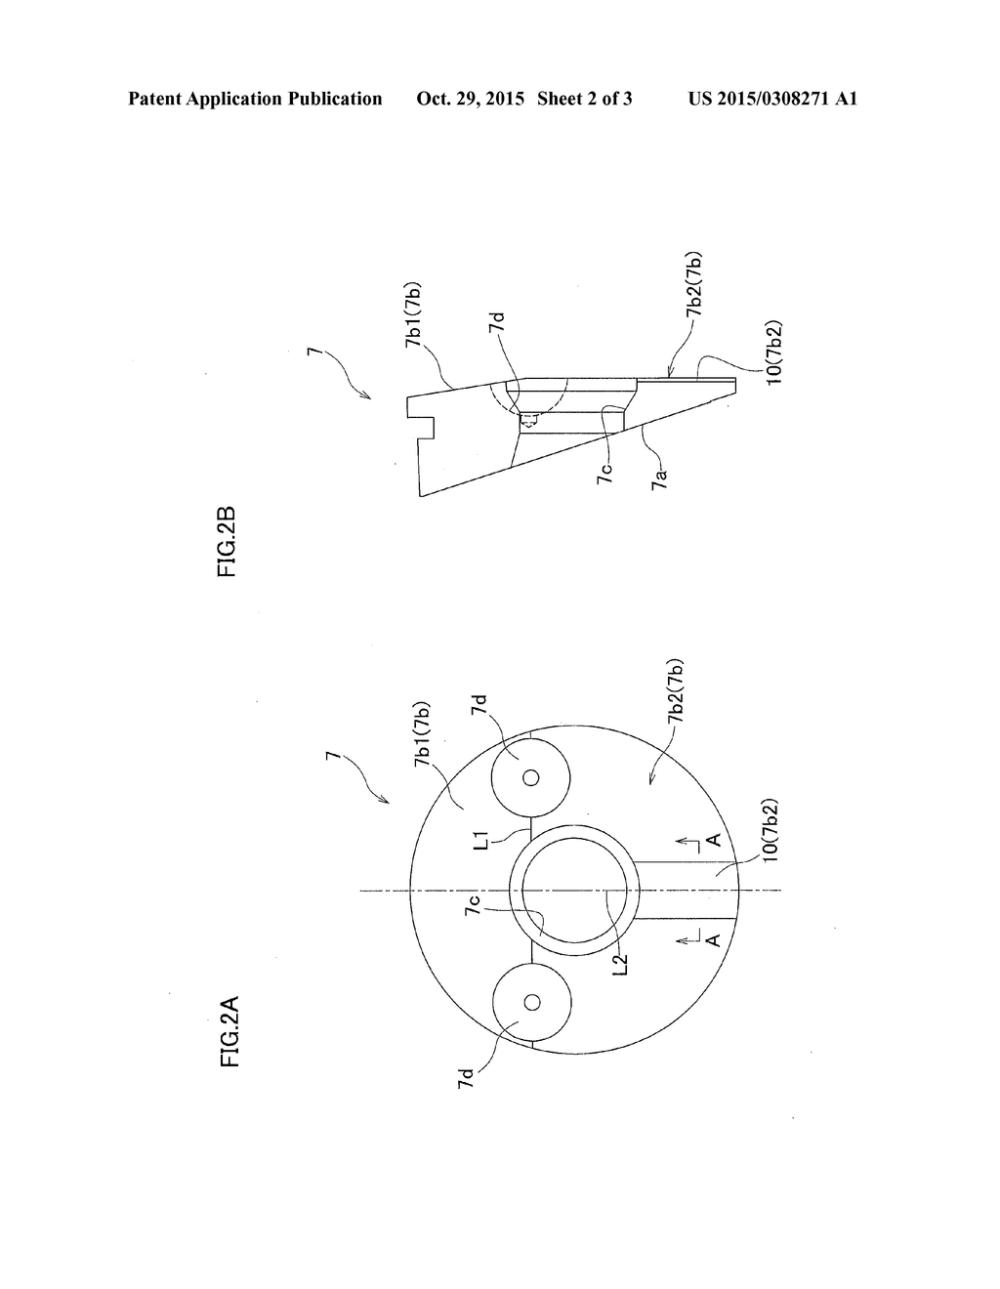 medium resolution of swash plate hydraulic motor or swash plate hydraulic pump diagram schematic and image 03